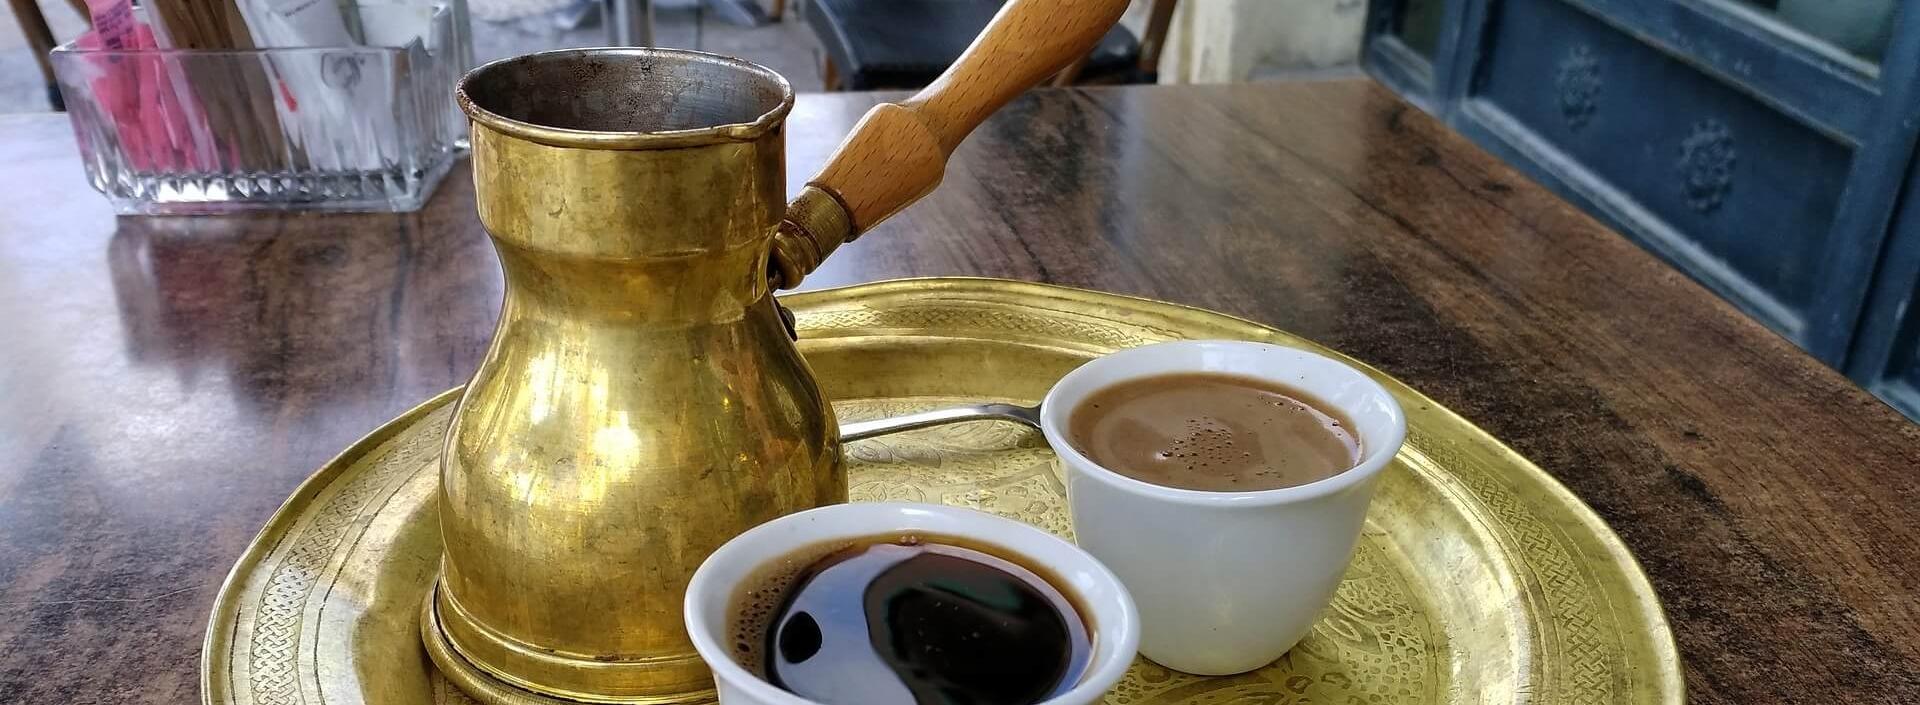 kaffeekanne header